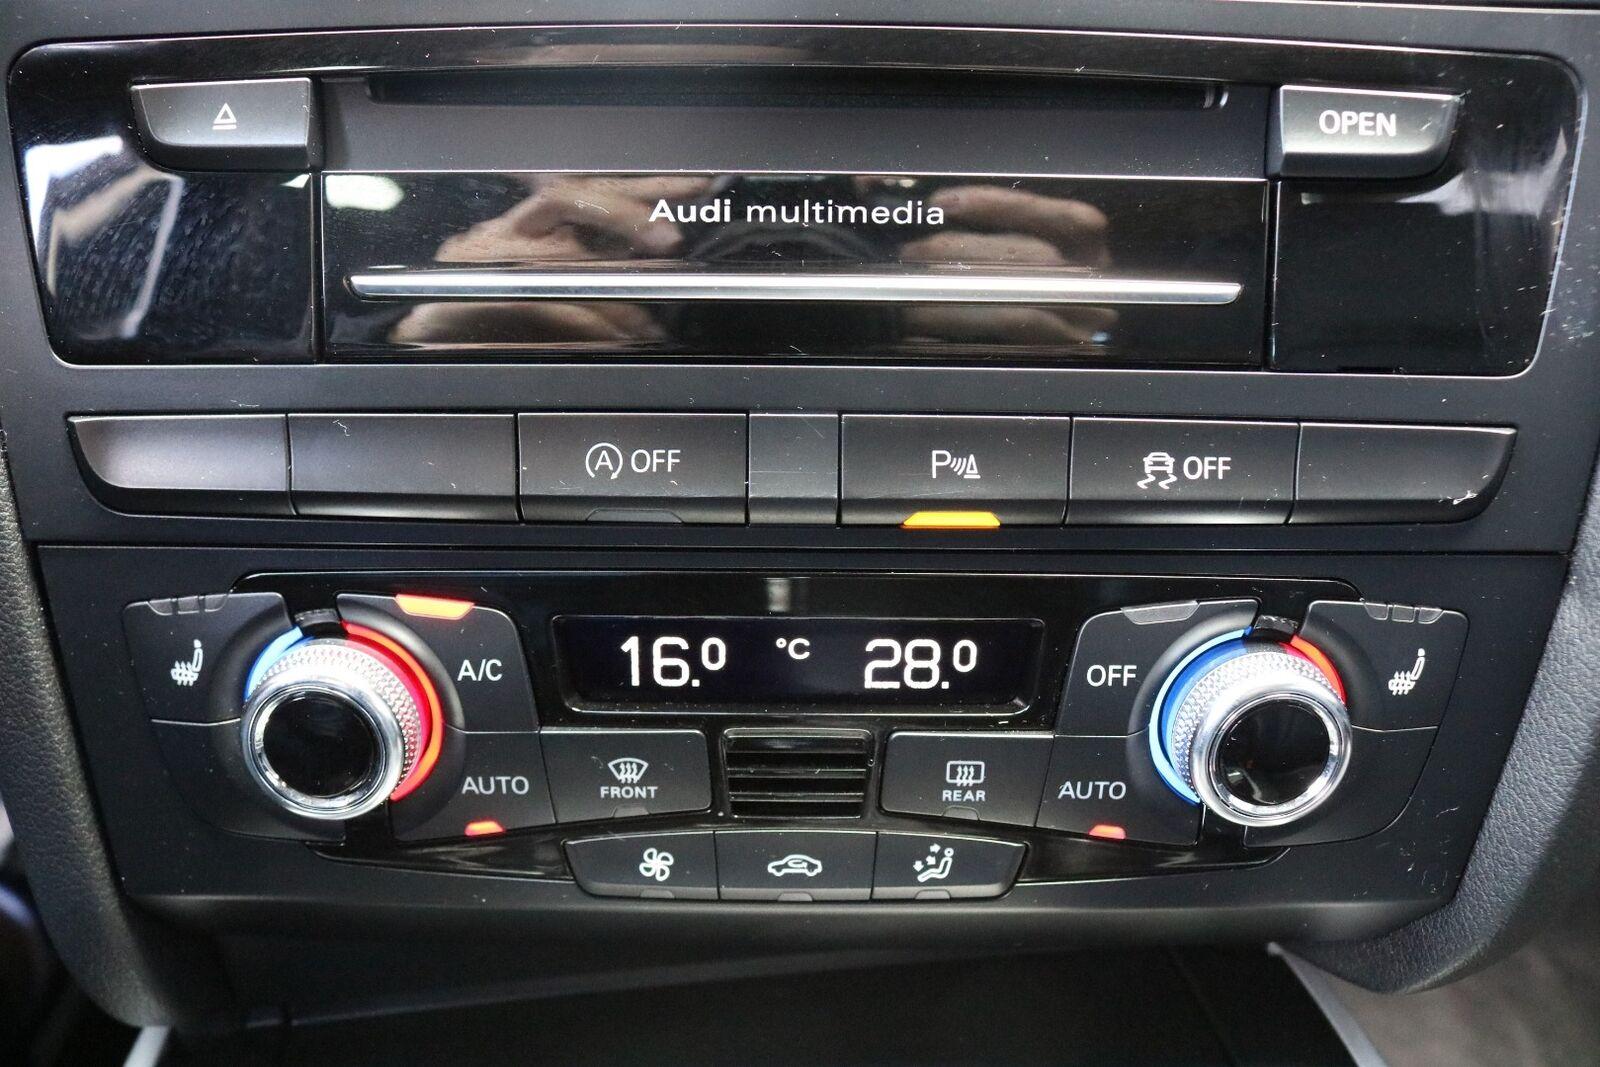 Audi A4 TDi 150 S-line Avant Multitr.